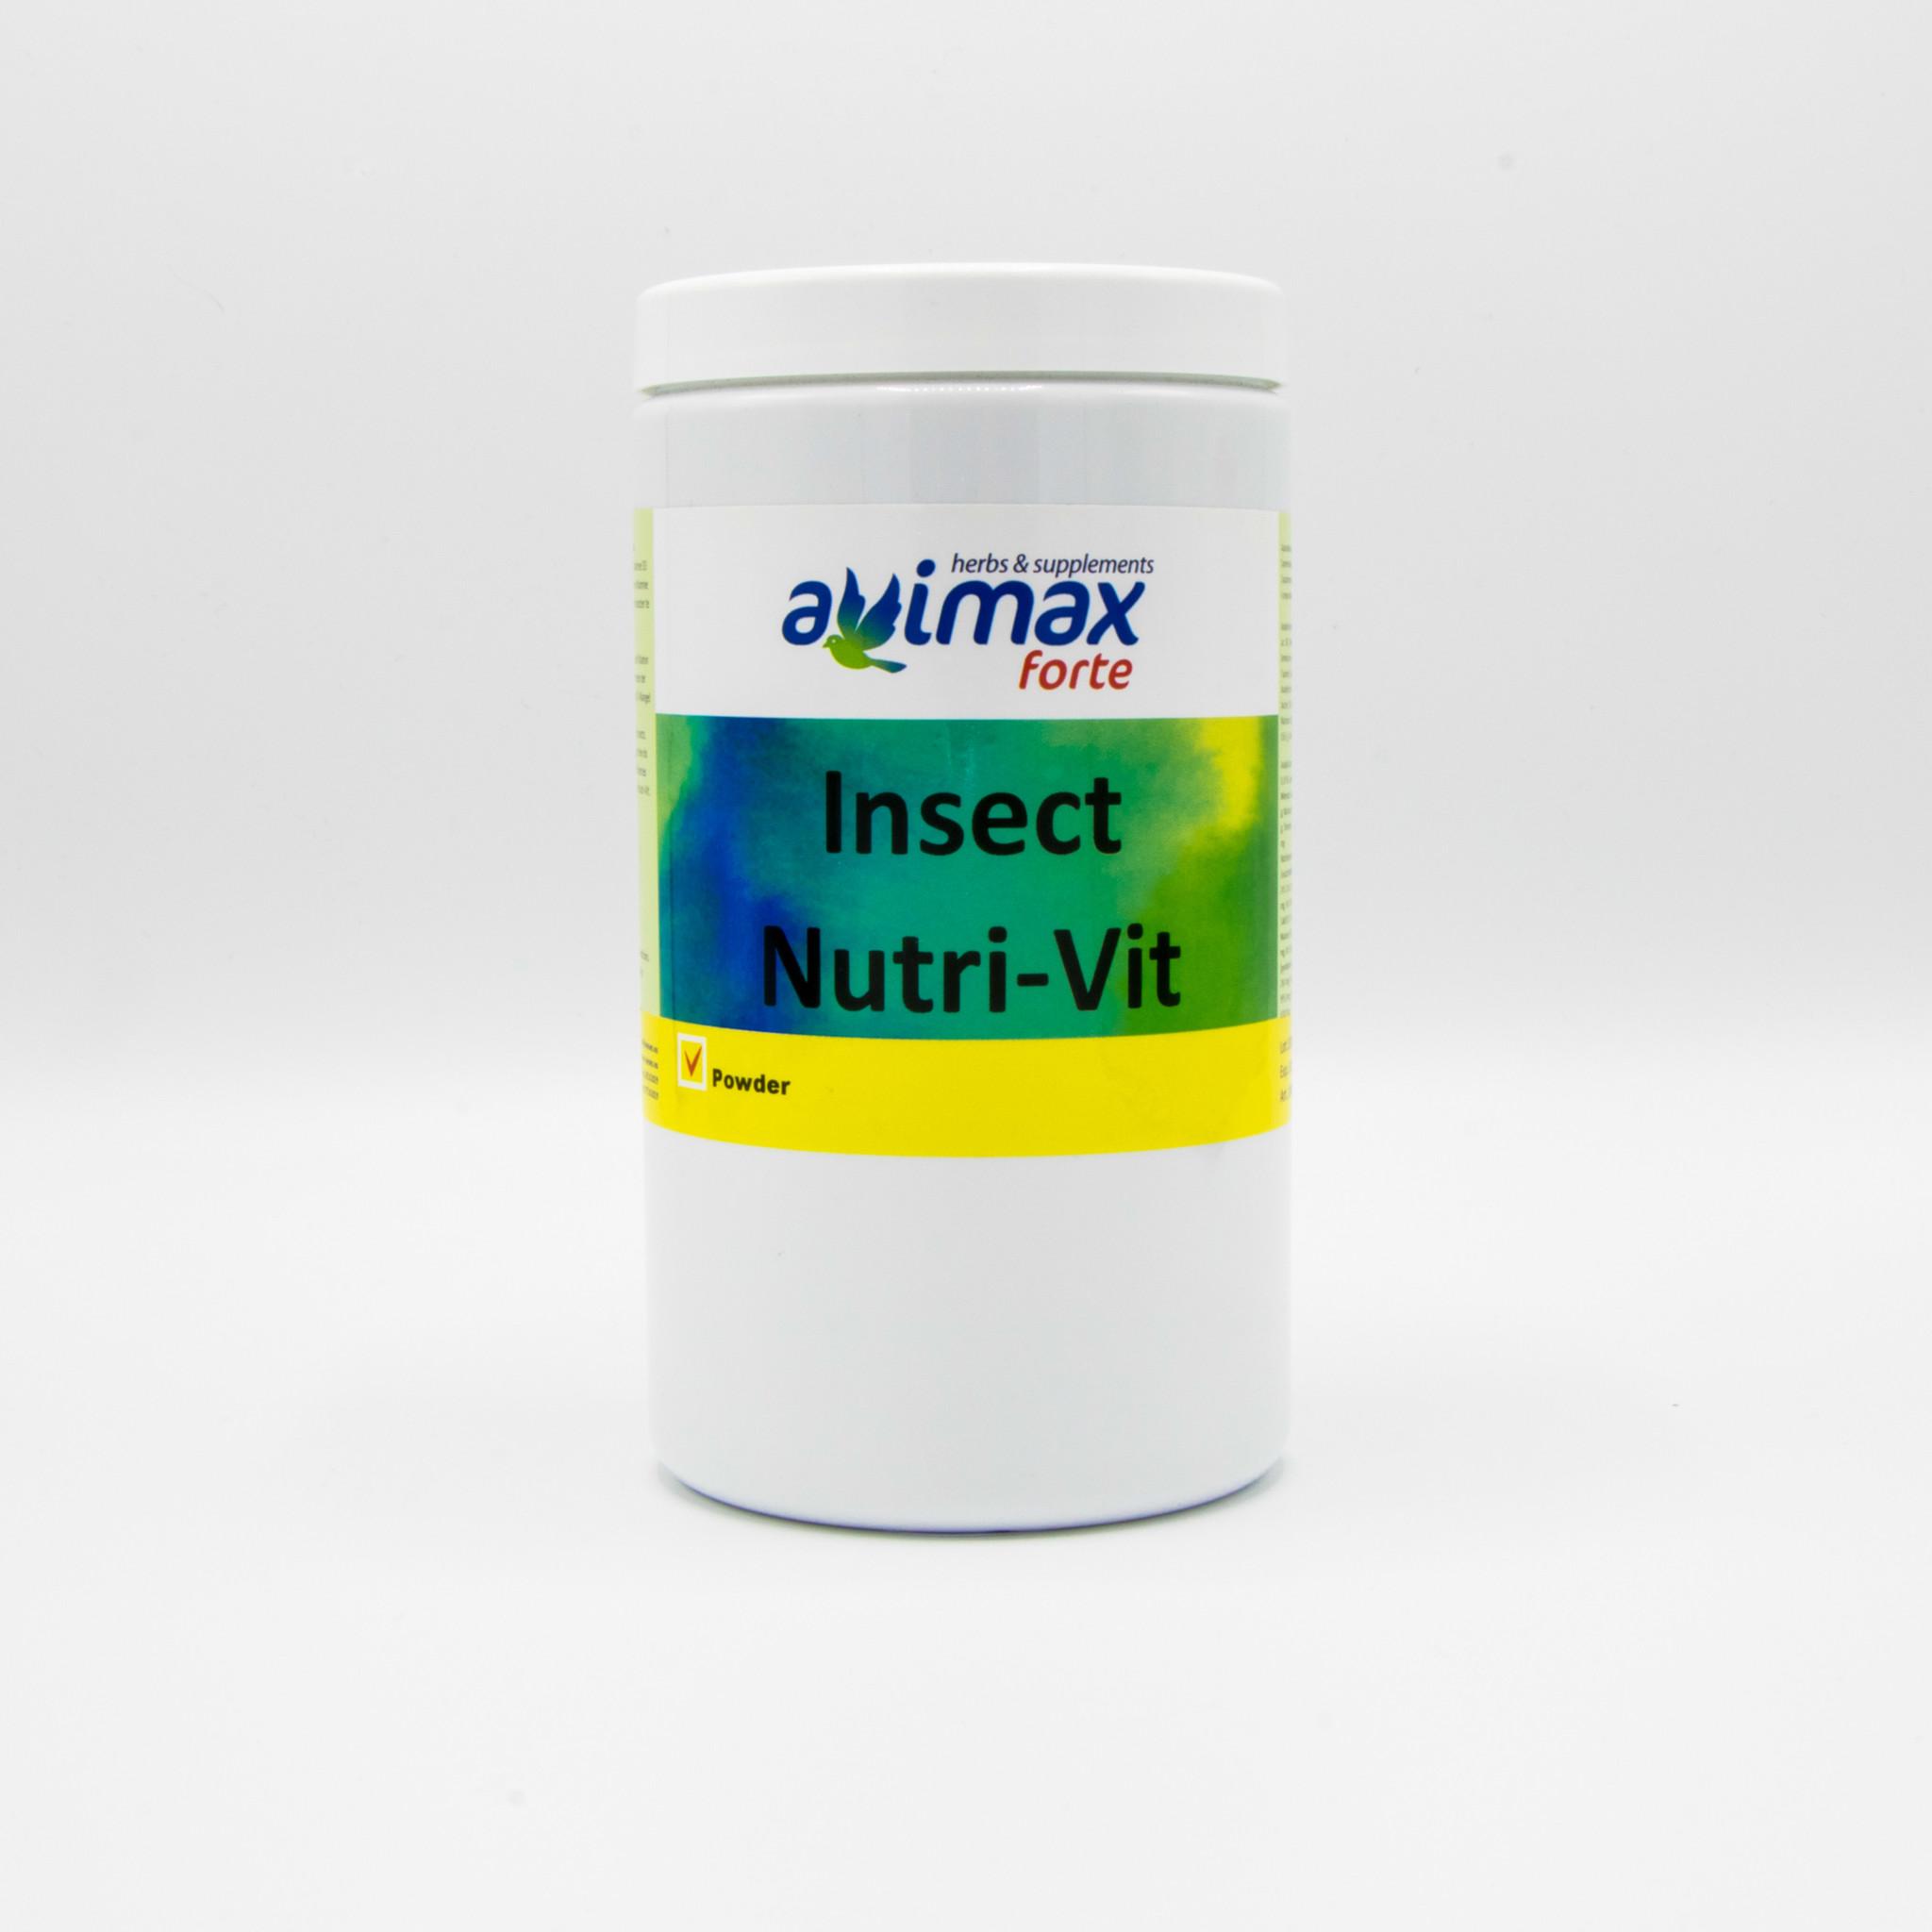 AviMax Forte Insect Nutri-Vit 750 gr